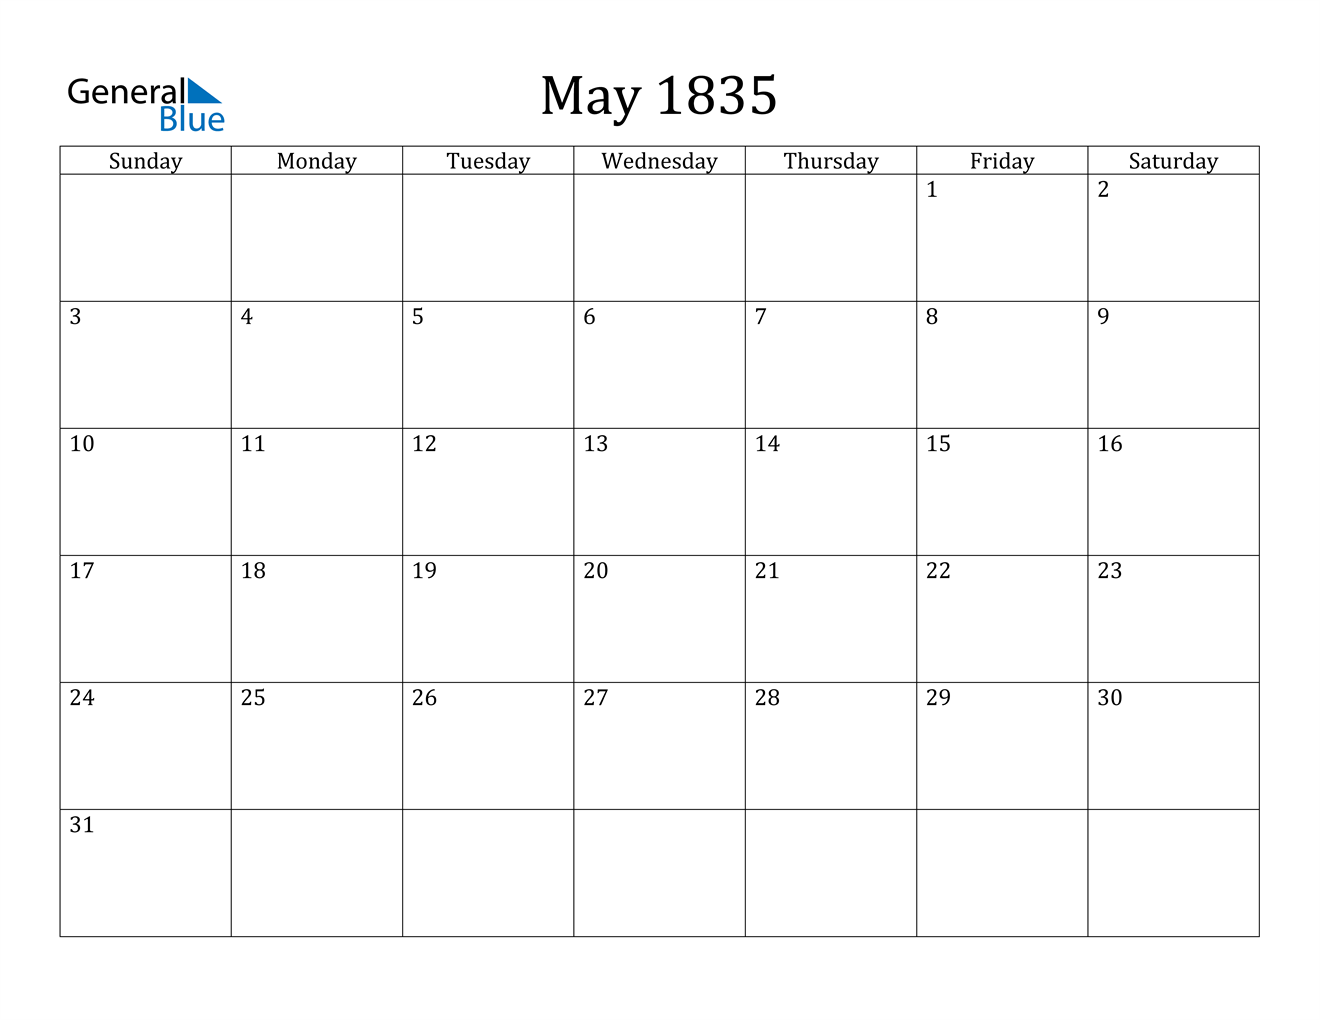 Image of May 1835 Calendar